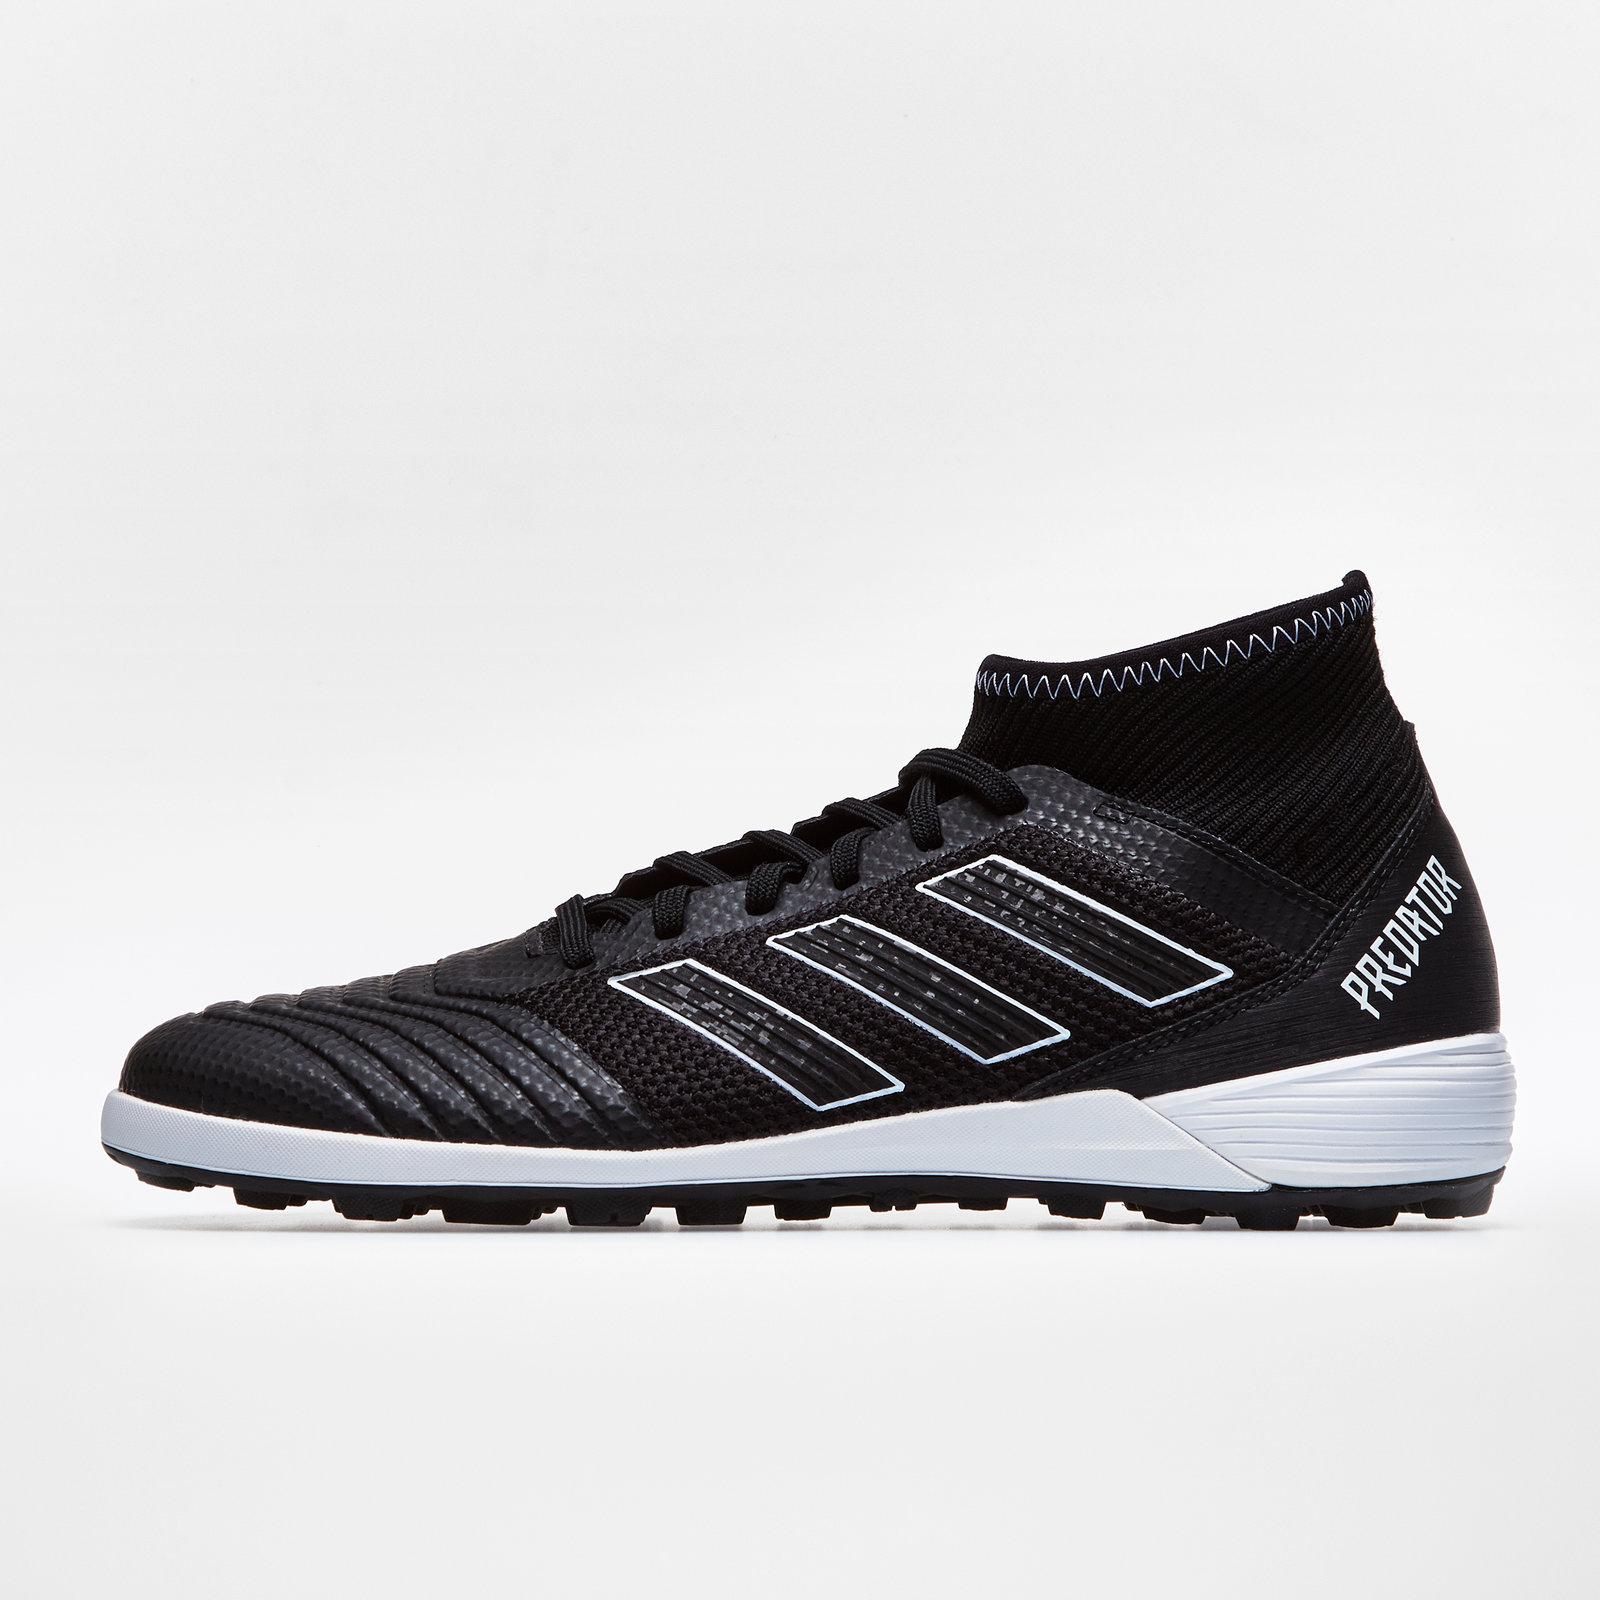 79deea23ef02a adidas Mens Predator Tango 18.3 TF Football Boots Studs Trainers Shoes Black